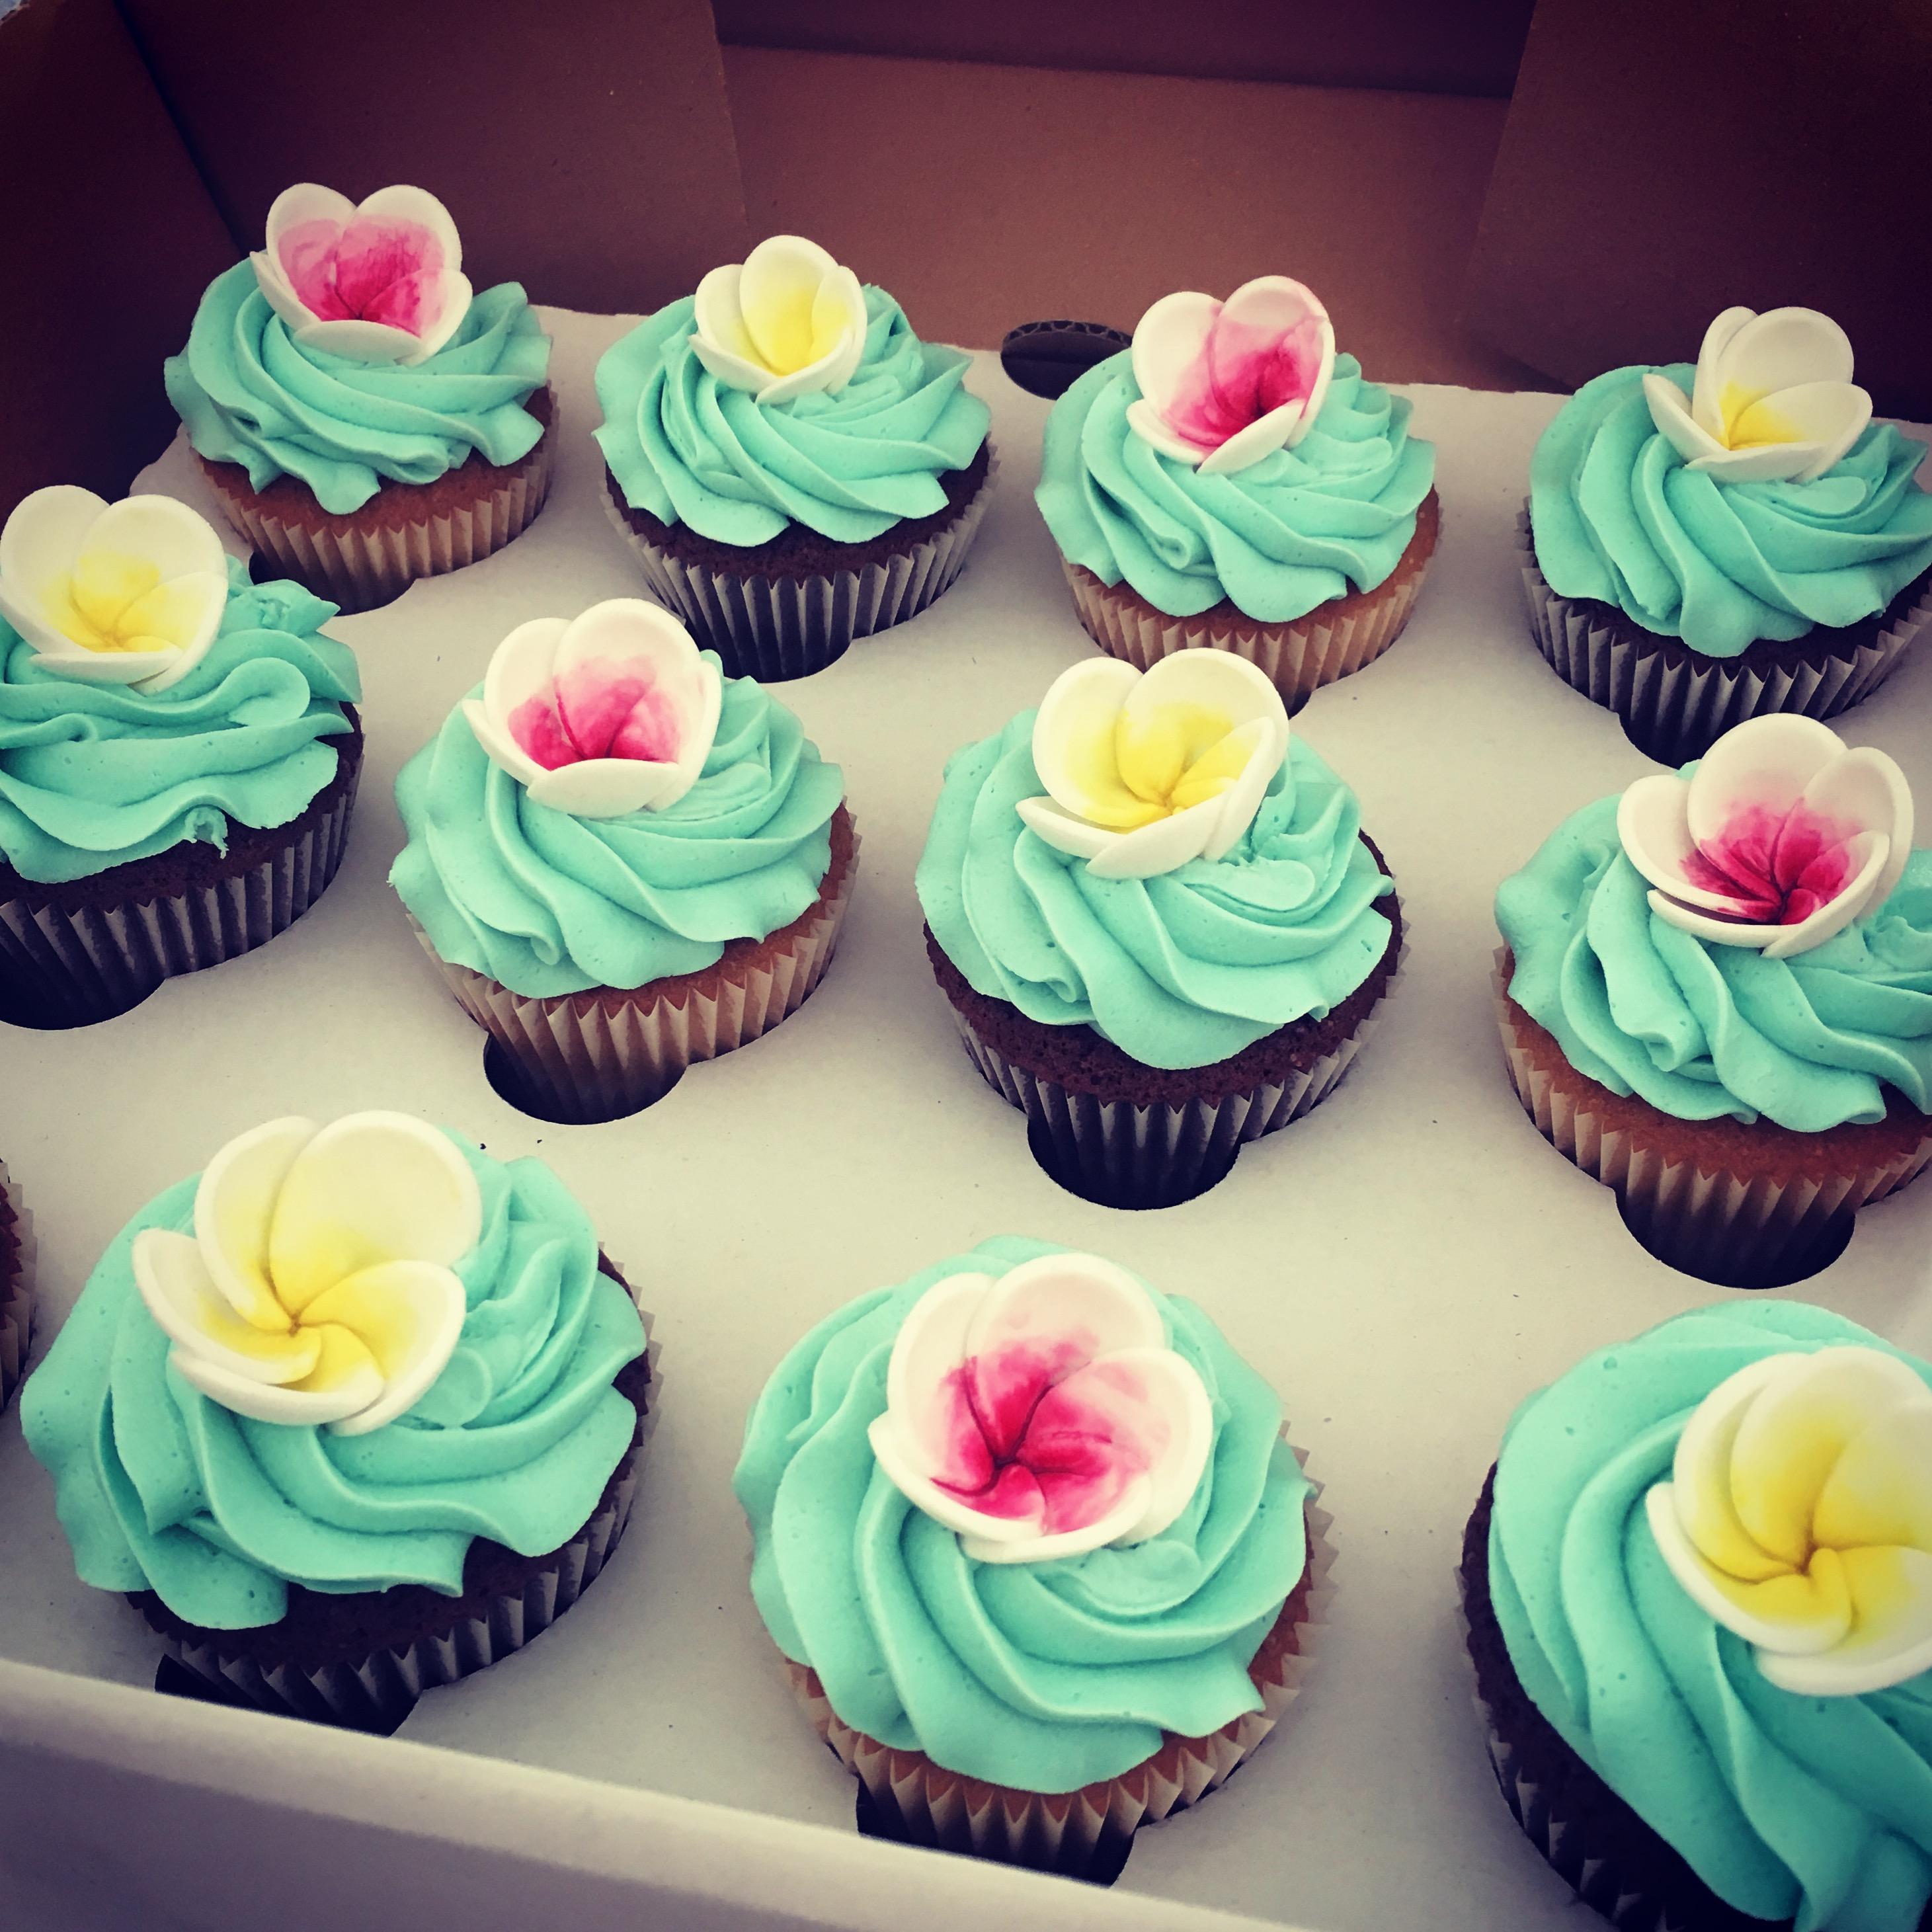 Frangipani Cupcakes